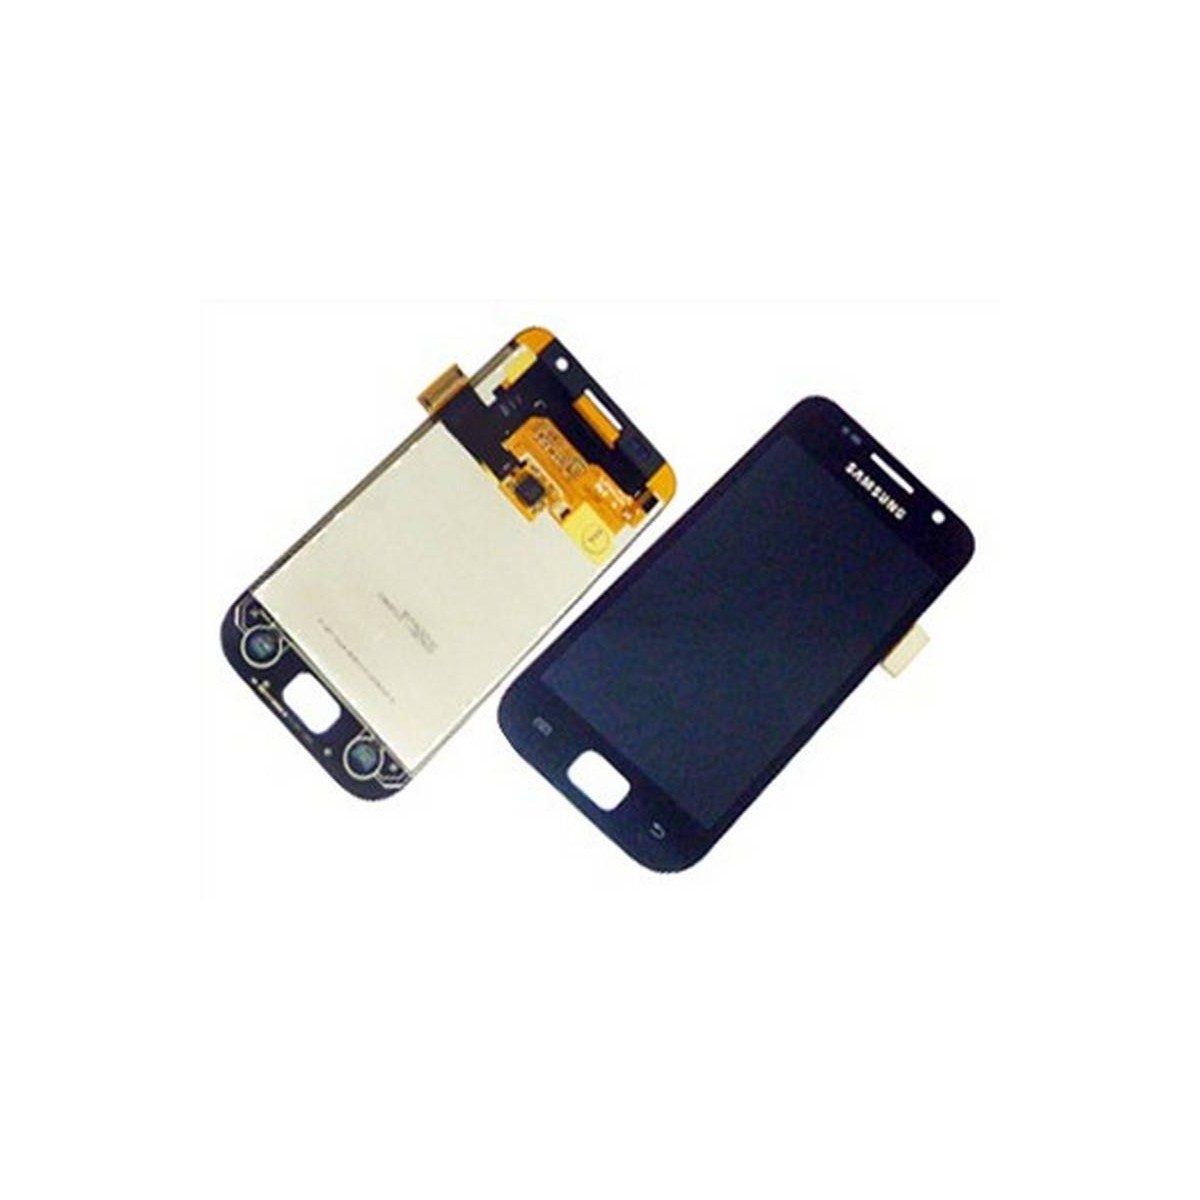 Display y Pantalla táctil (Digitalizador) para Samsung Galaxy S SCL i9003 Super amoled